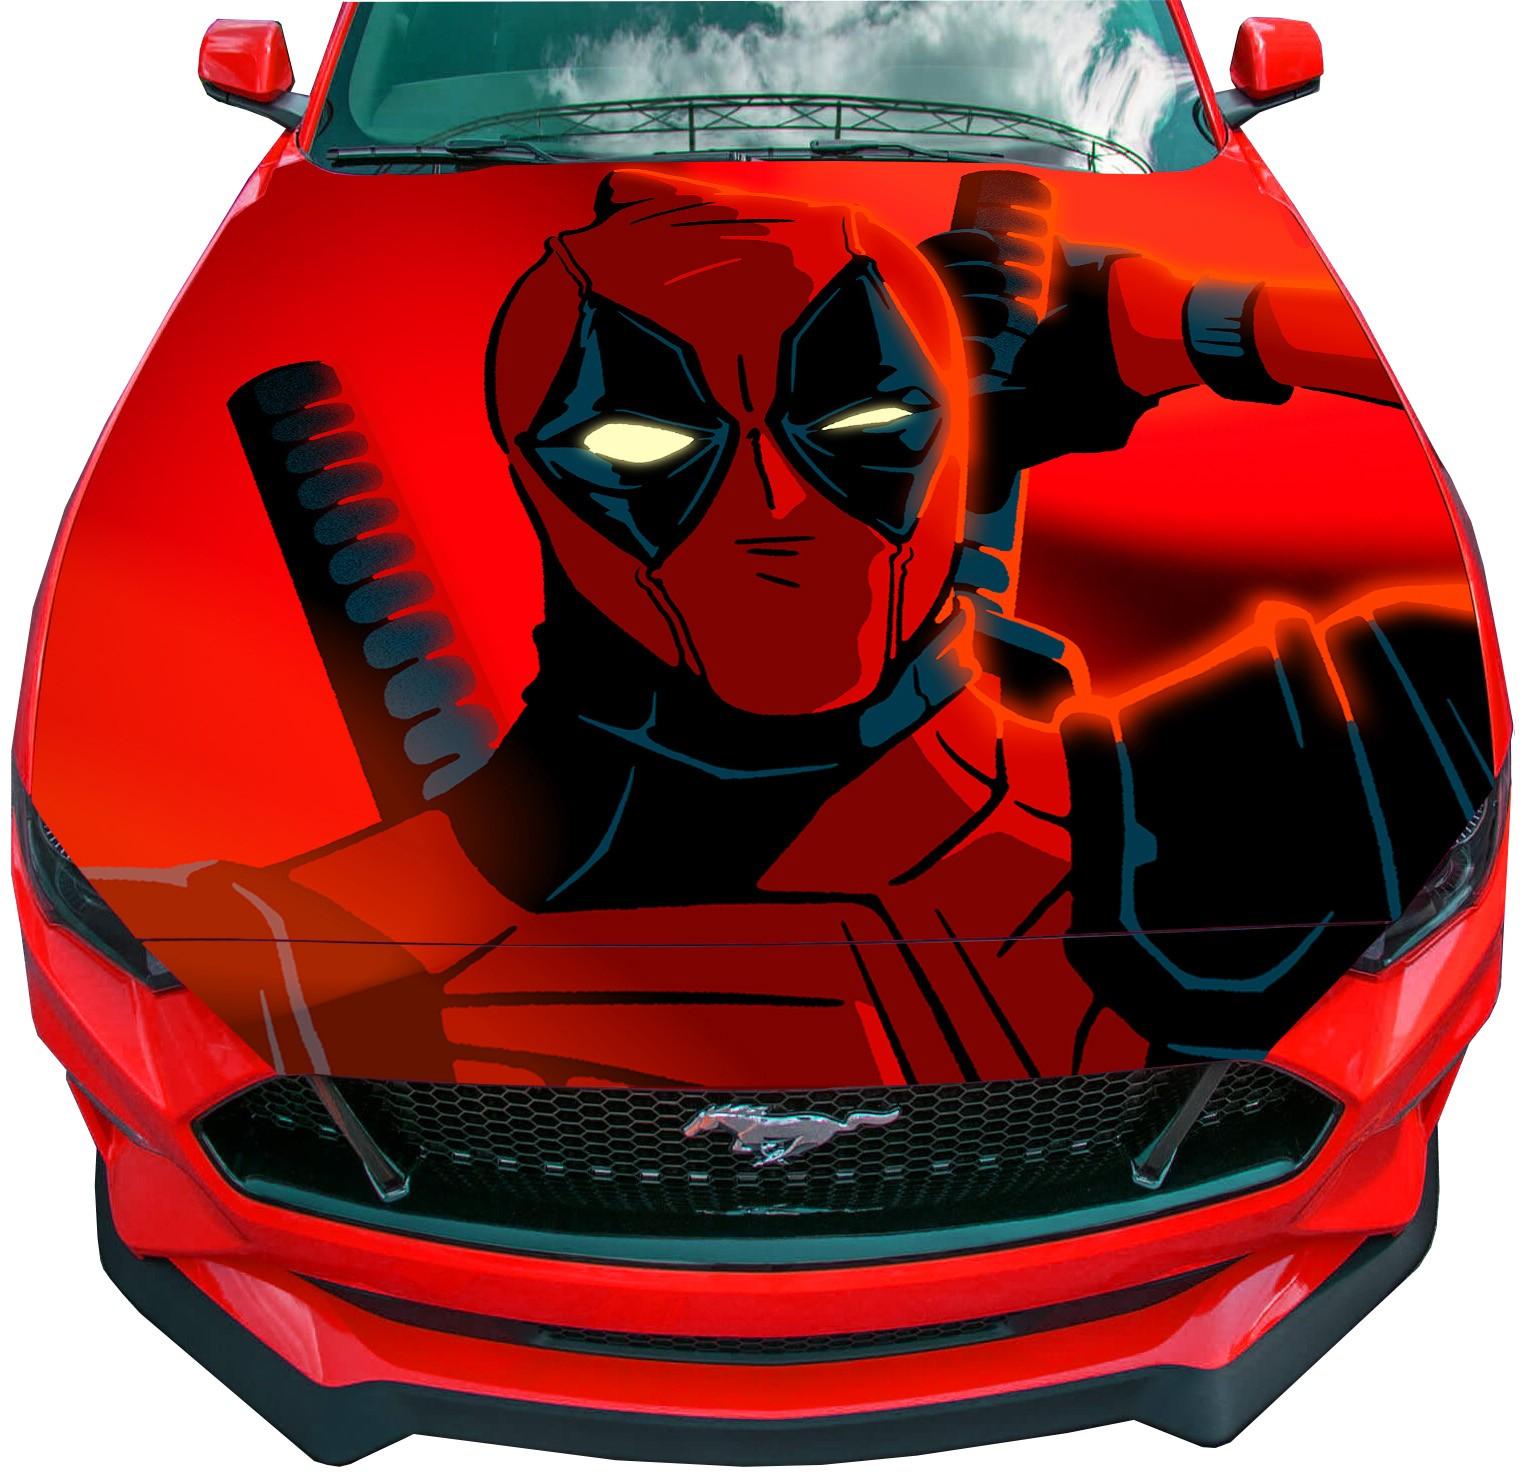 Deadpool car  vinyl decal sticker